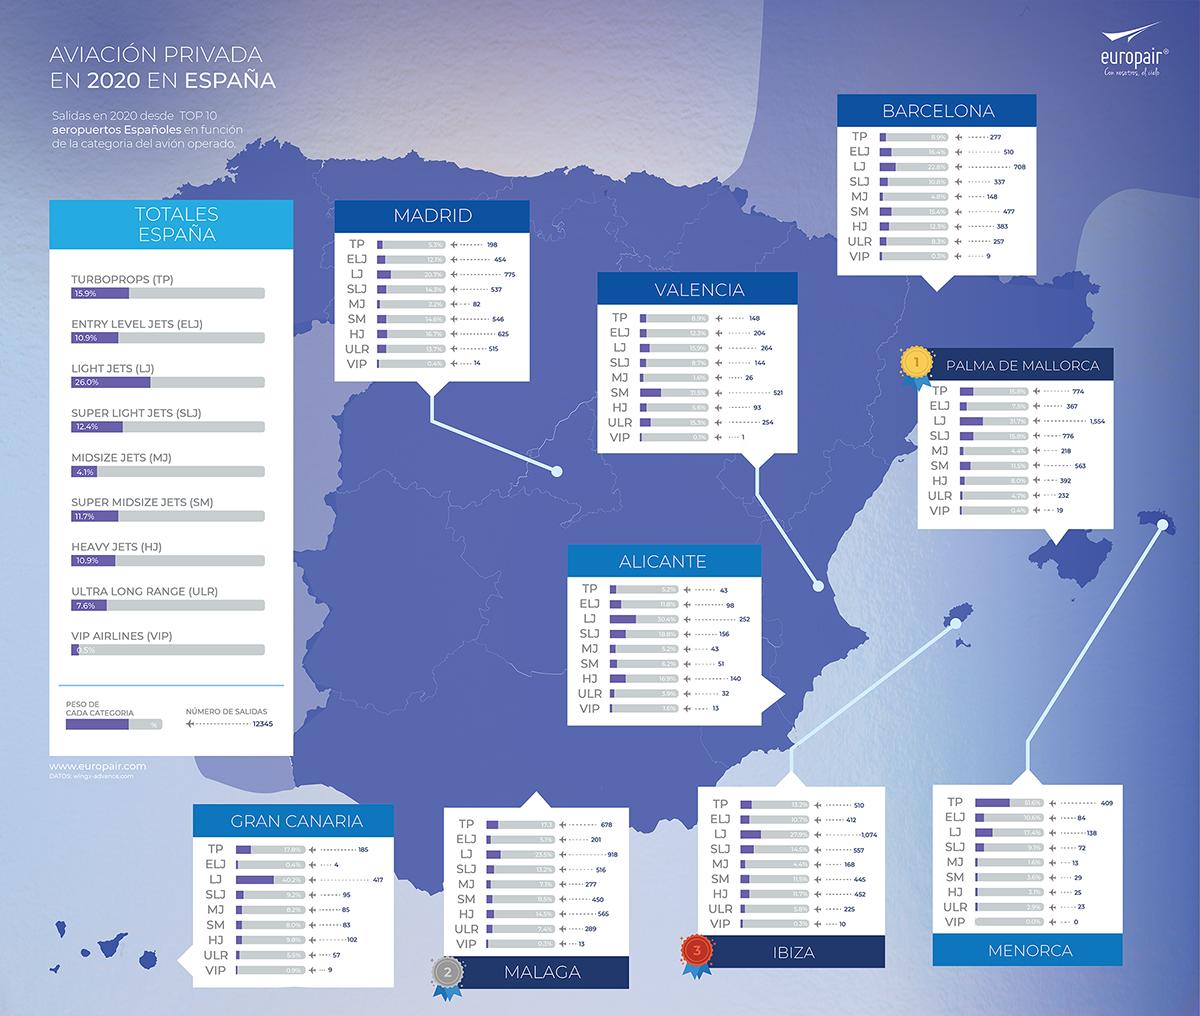 espana_mapa03_72_small.png